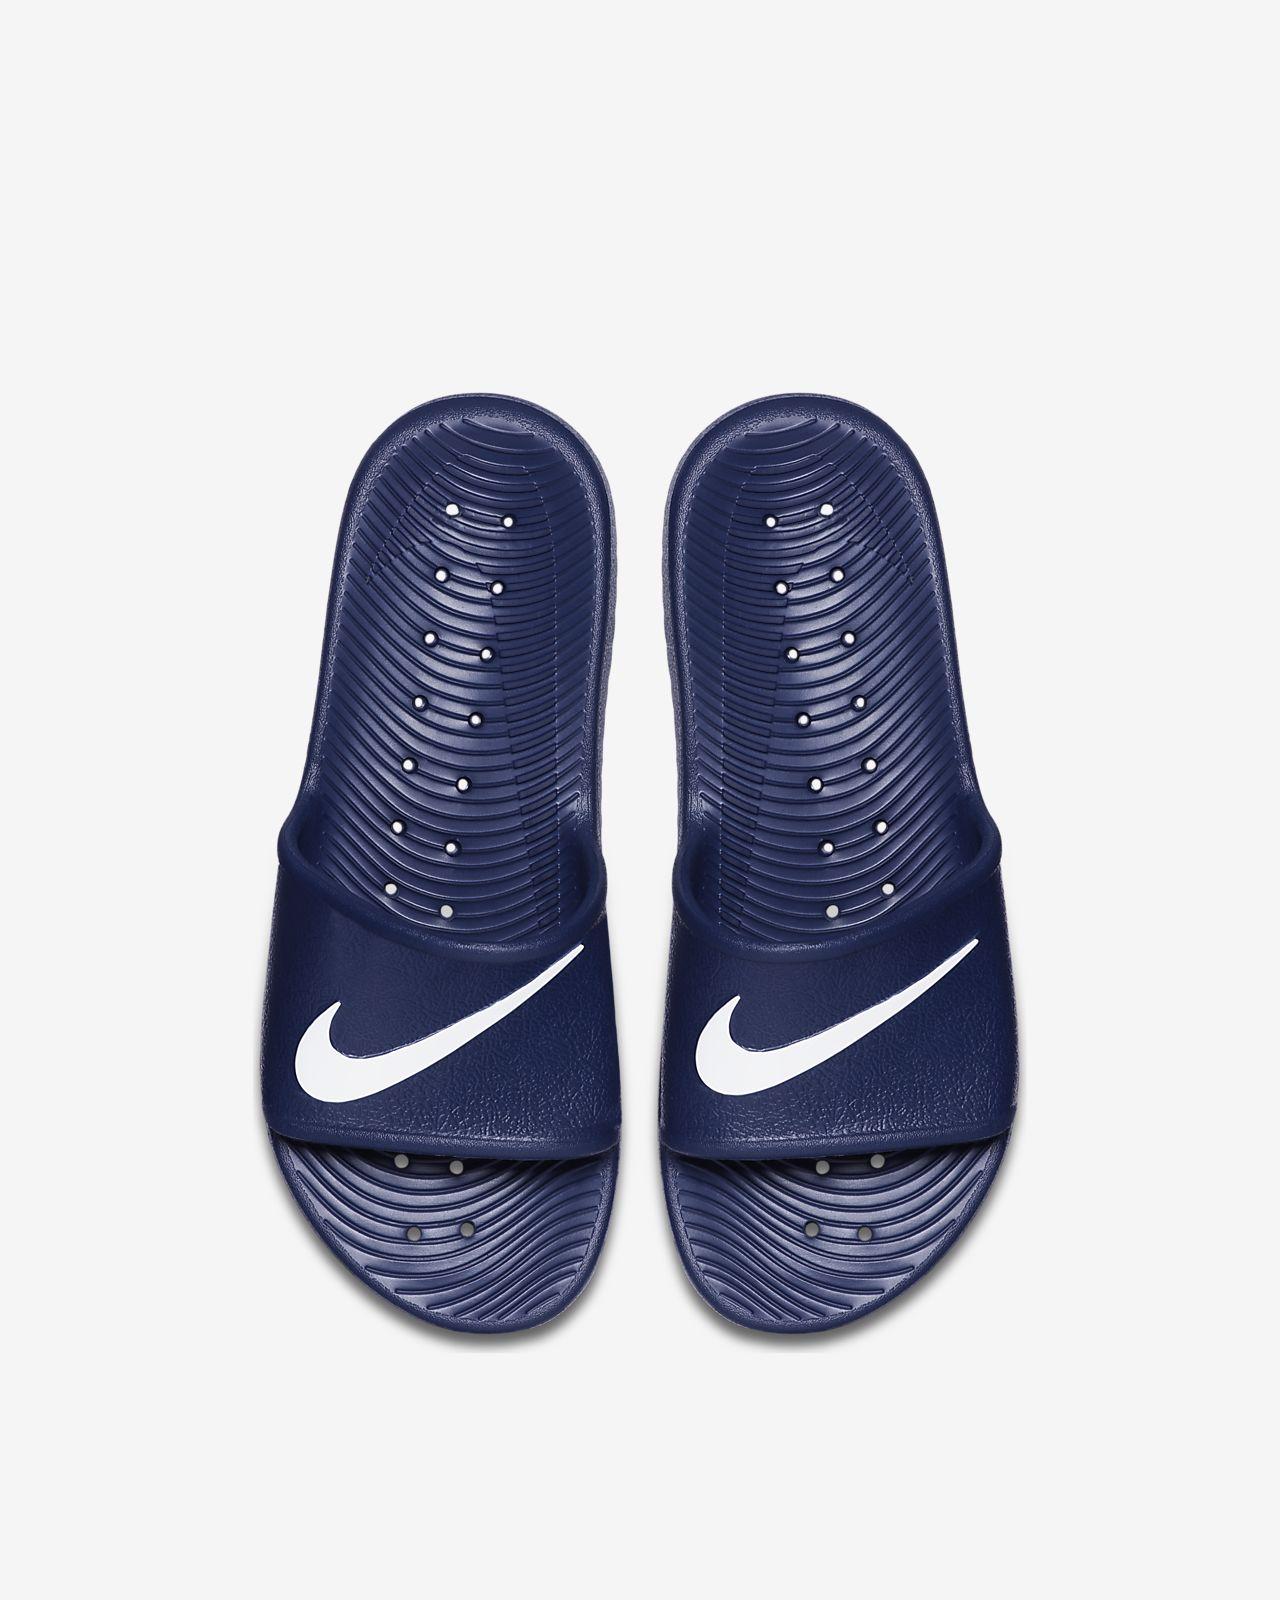 1b53d24a76e Claquette Nike Kawa Shower pour Homme. Nike.com CA